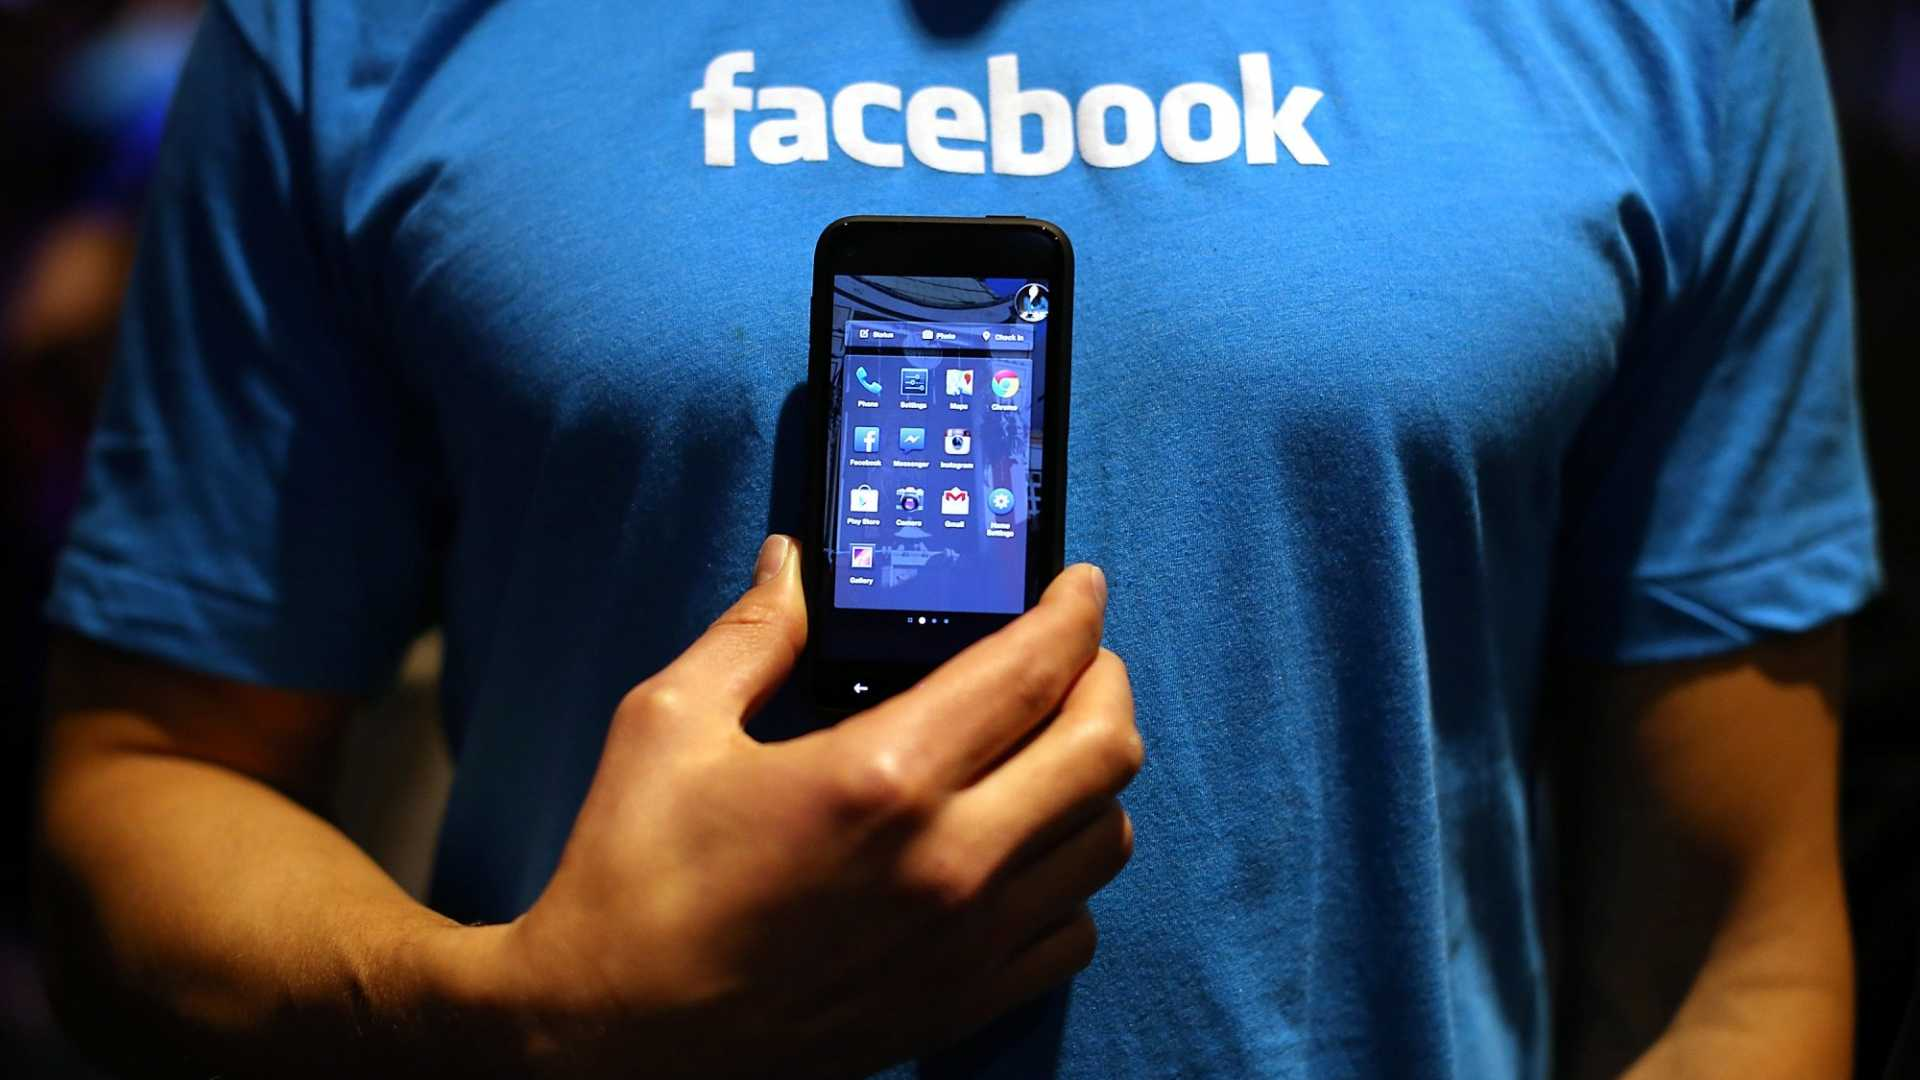 Facebook Raises Minimum Pay for Contractors to $15 per Hour